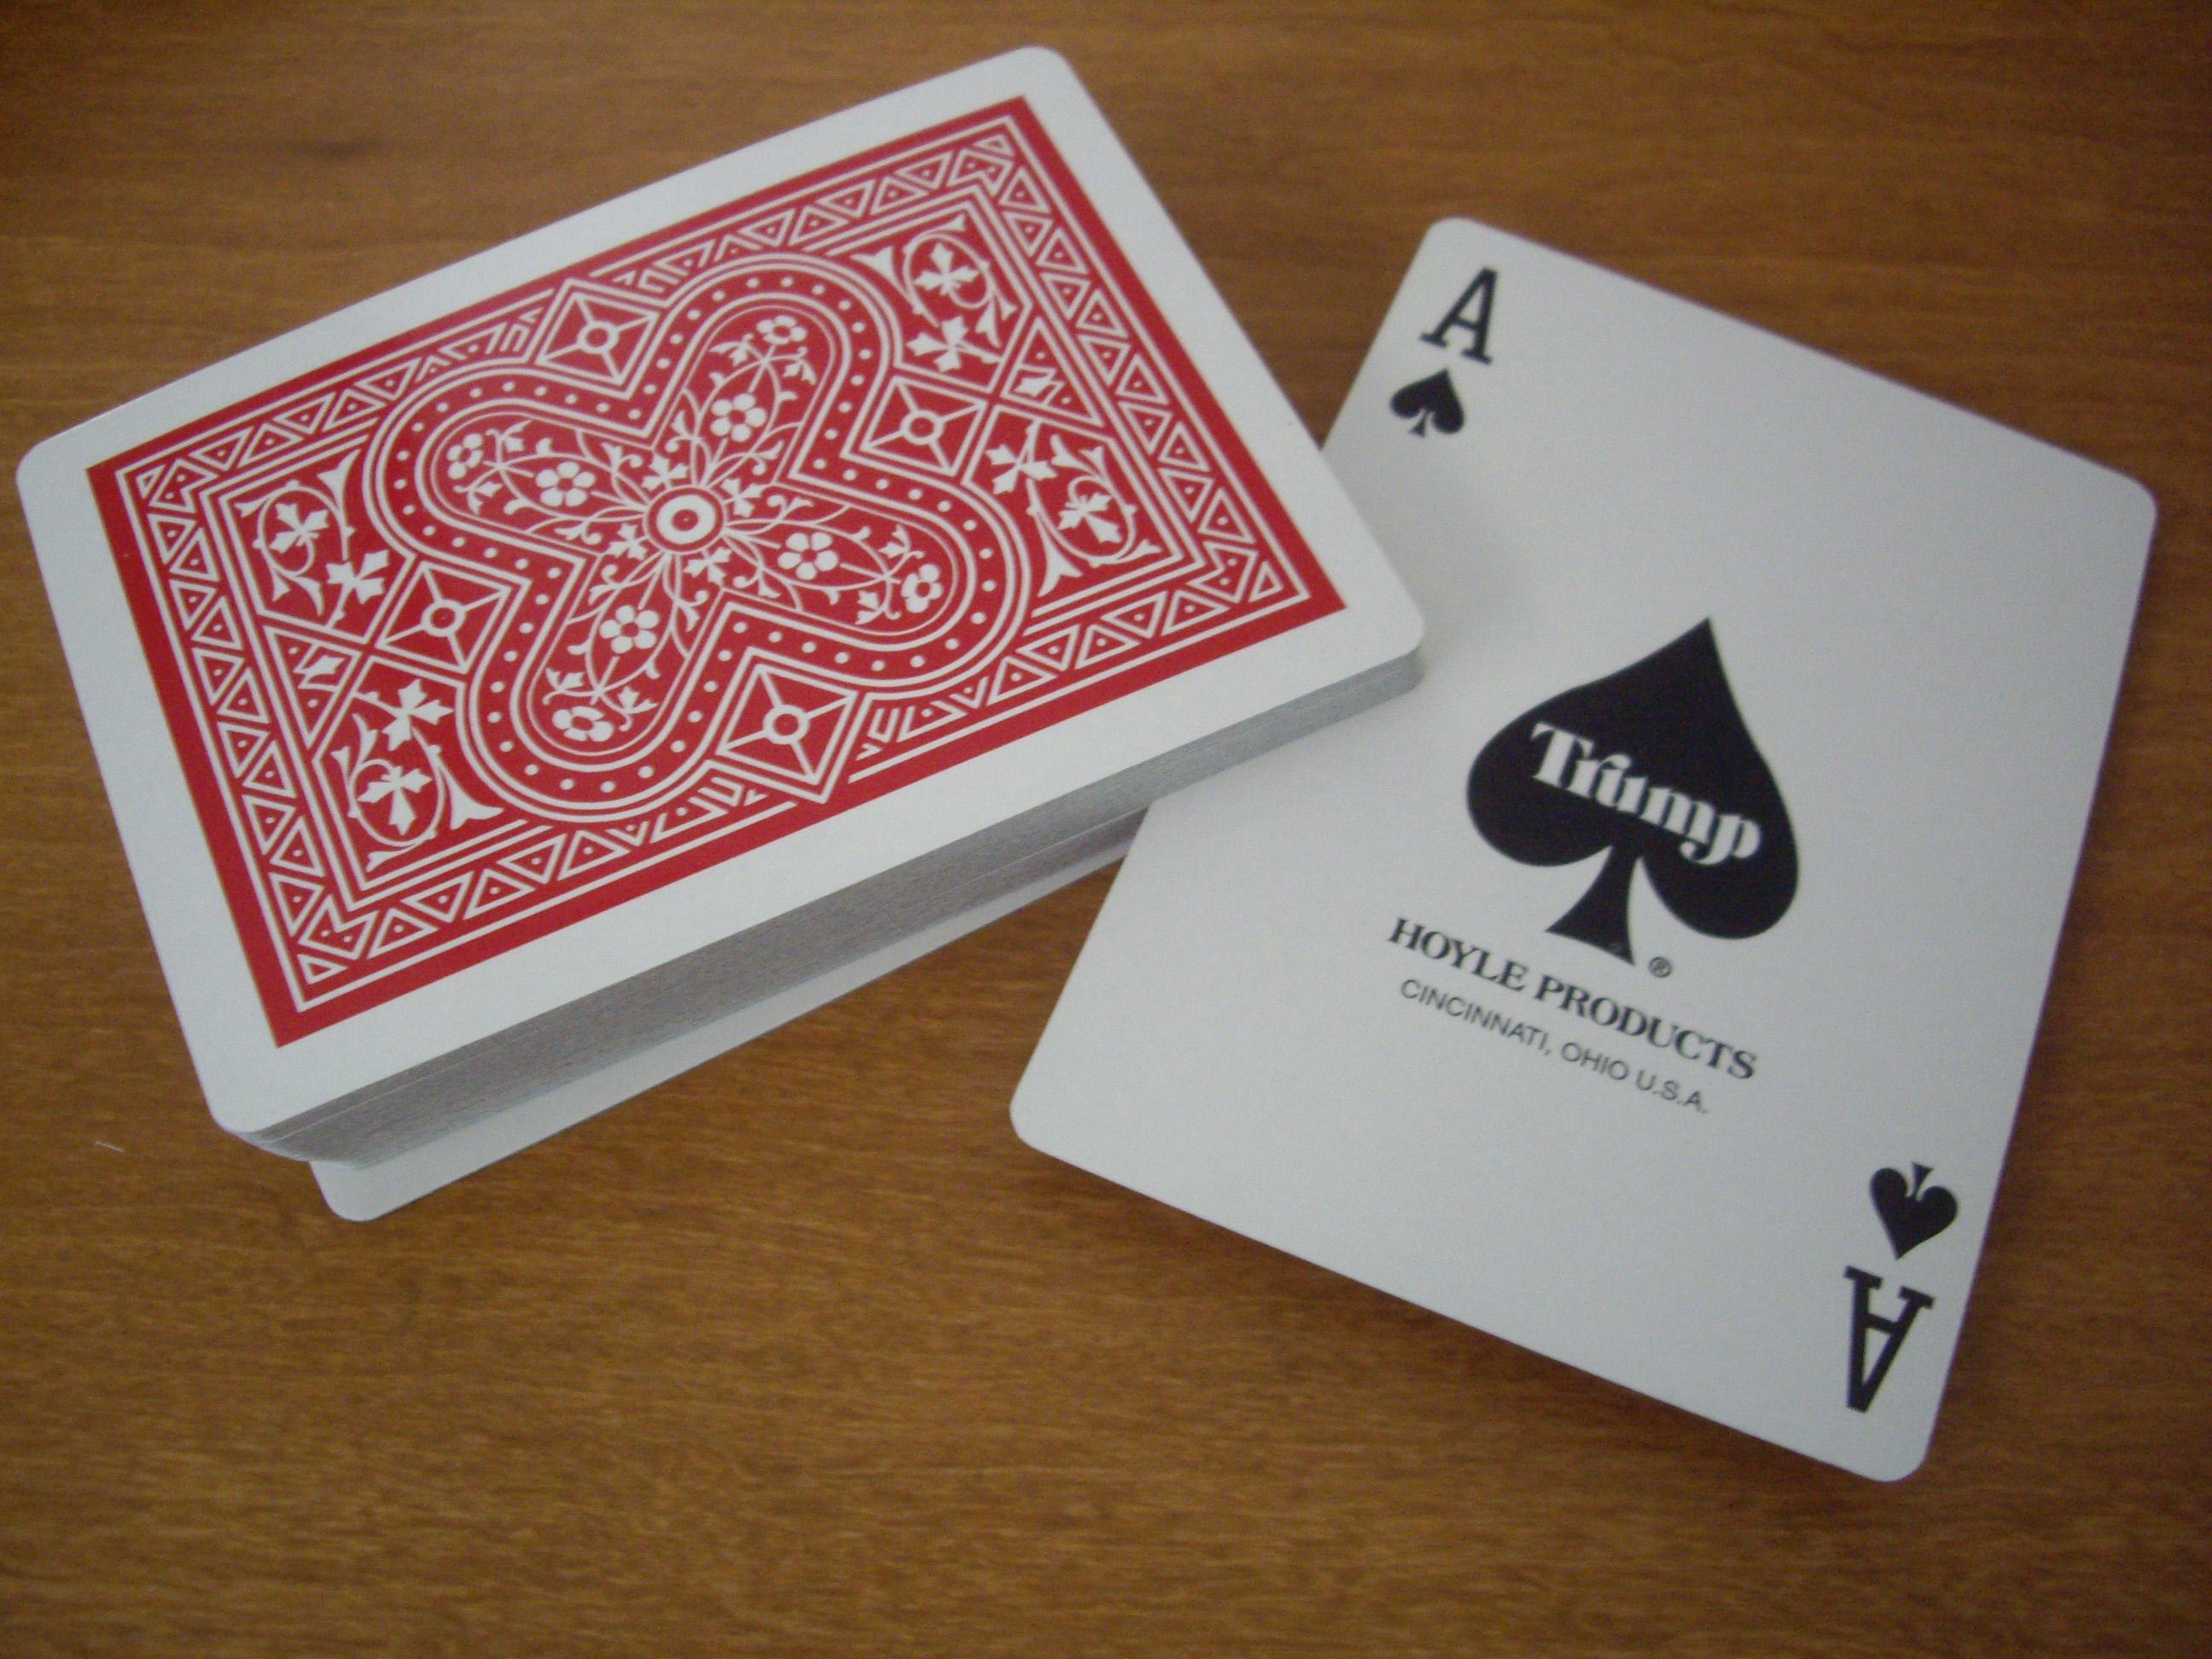 Trump : Ace of Spades = Minimalistic